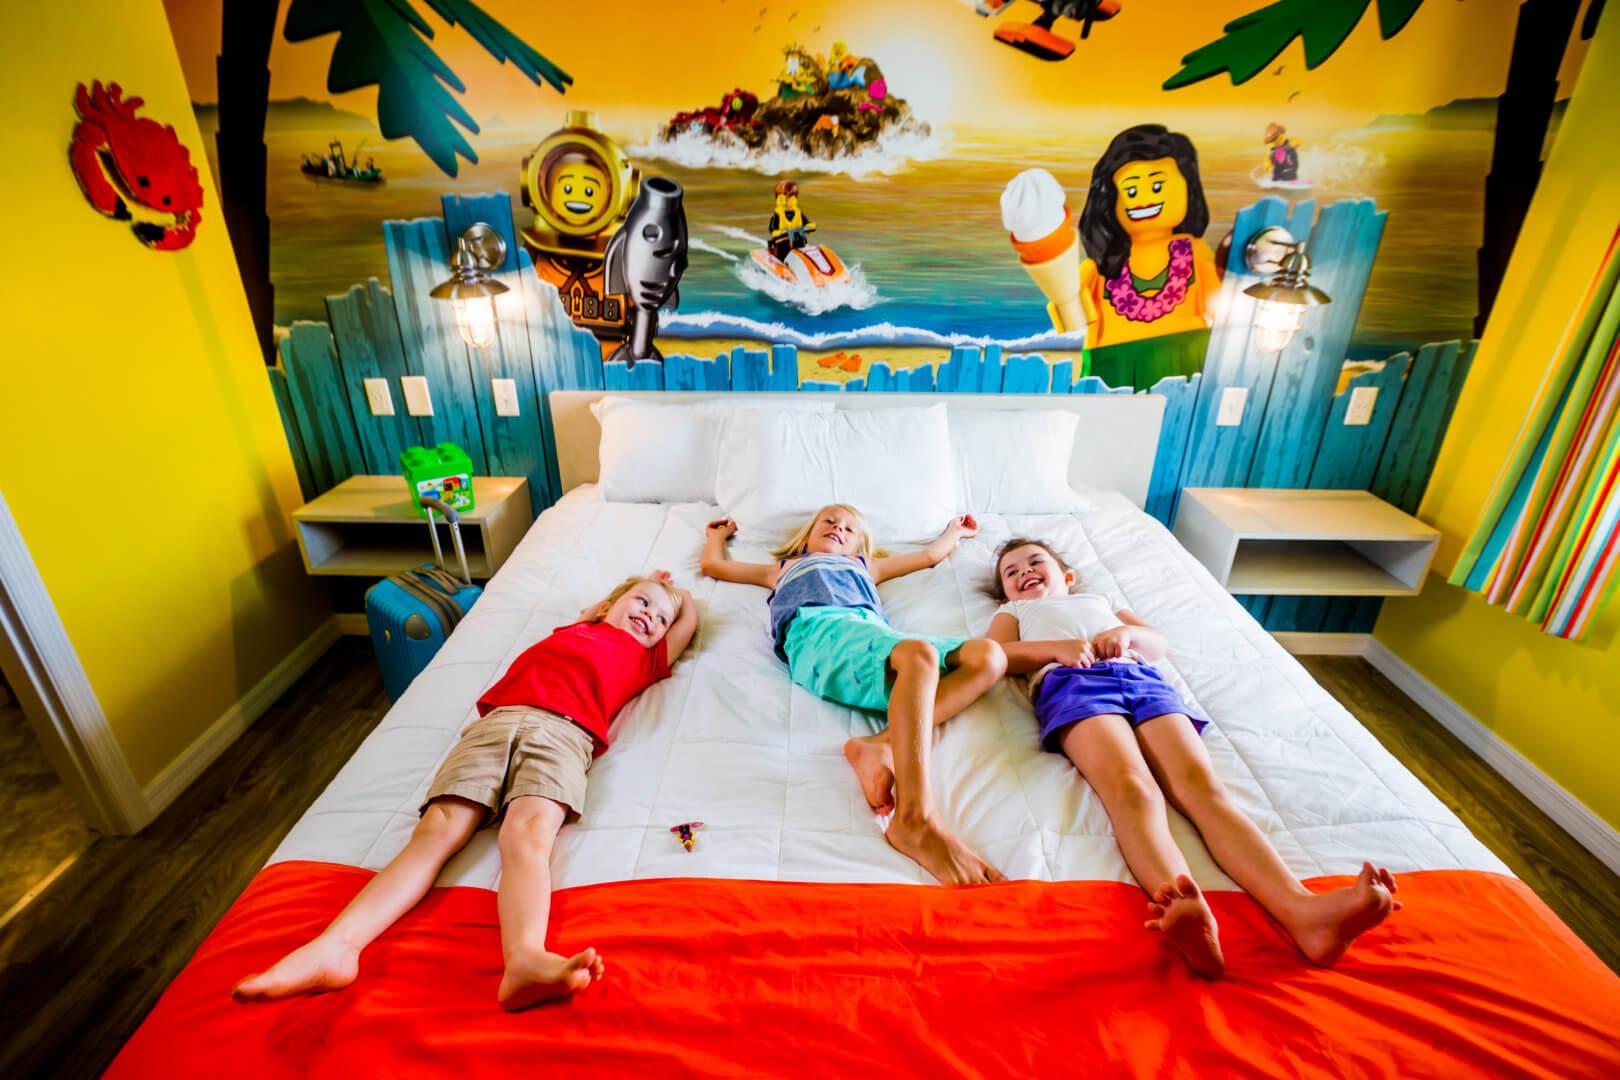 Hotels near Legoland California, USA. - Booking.com